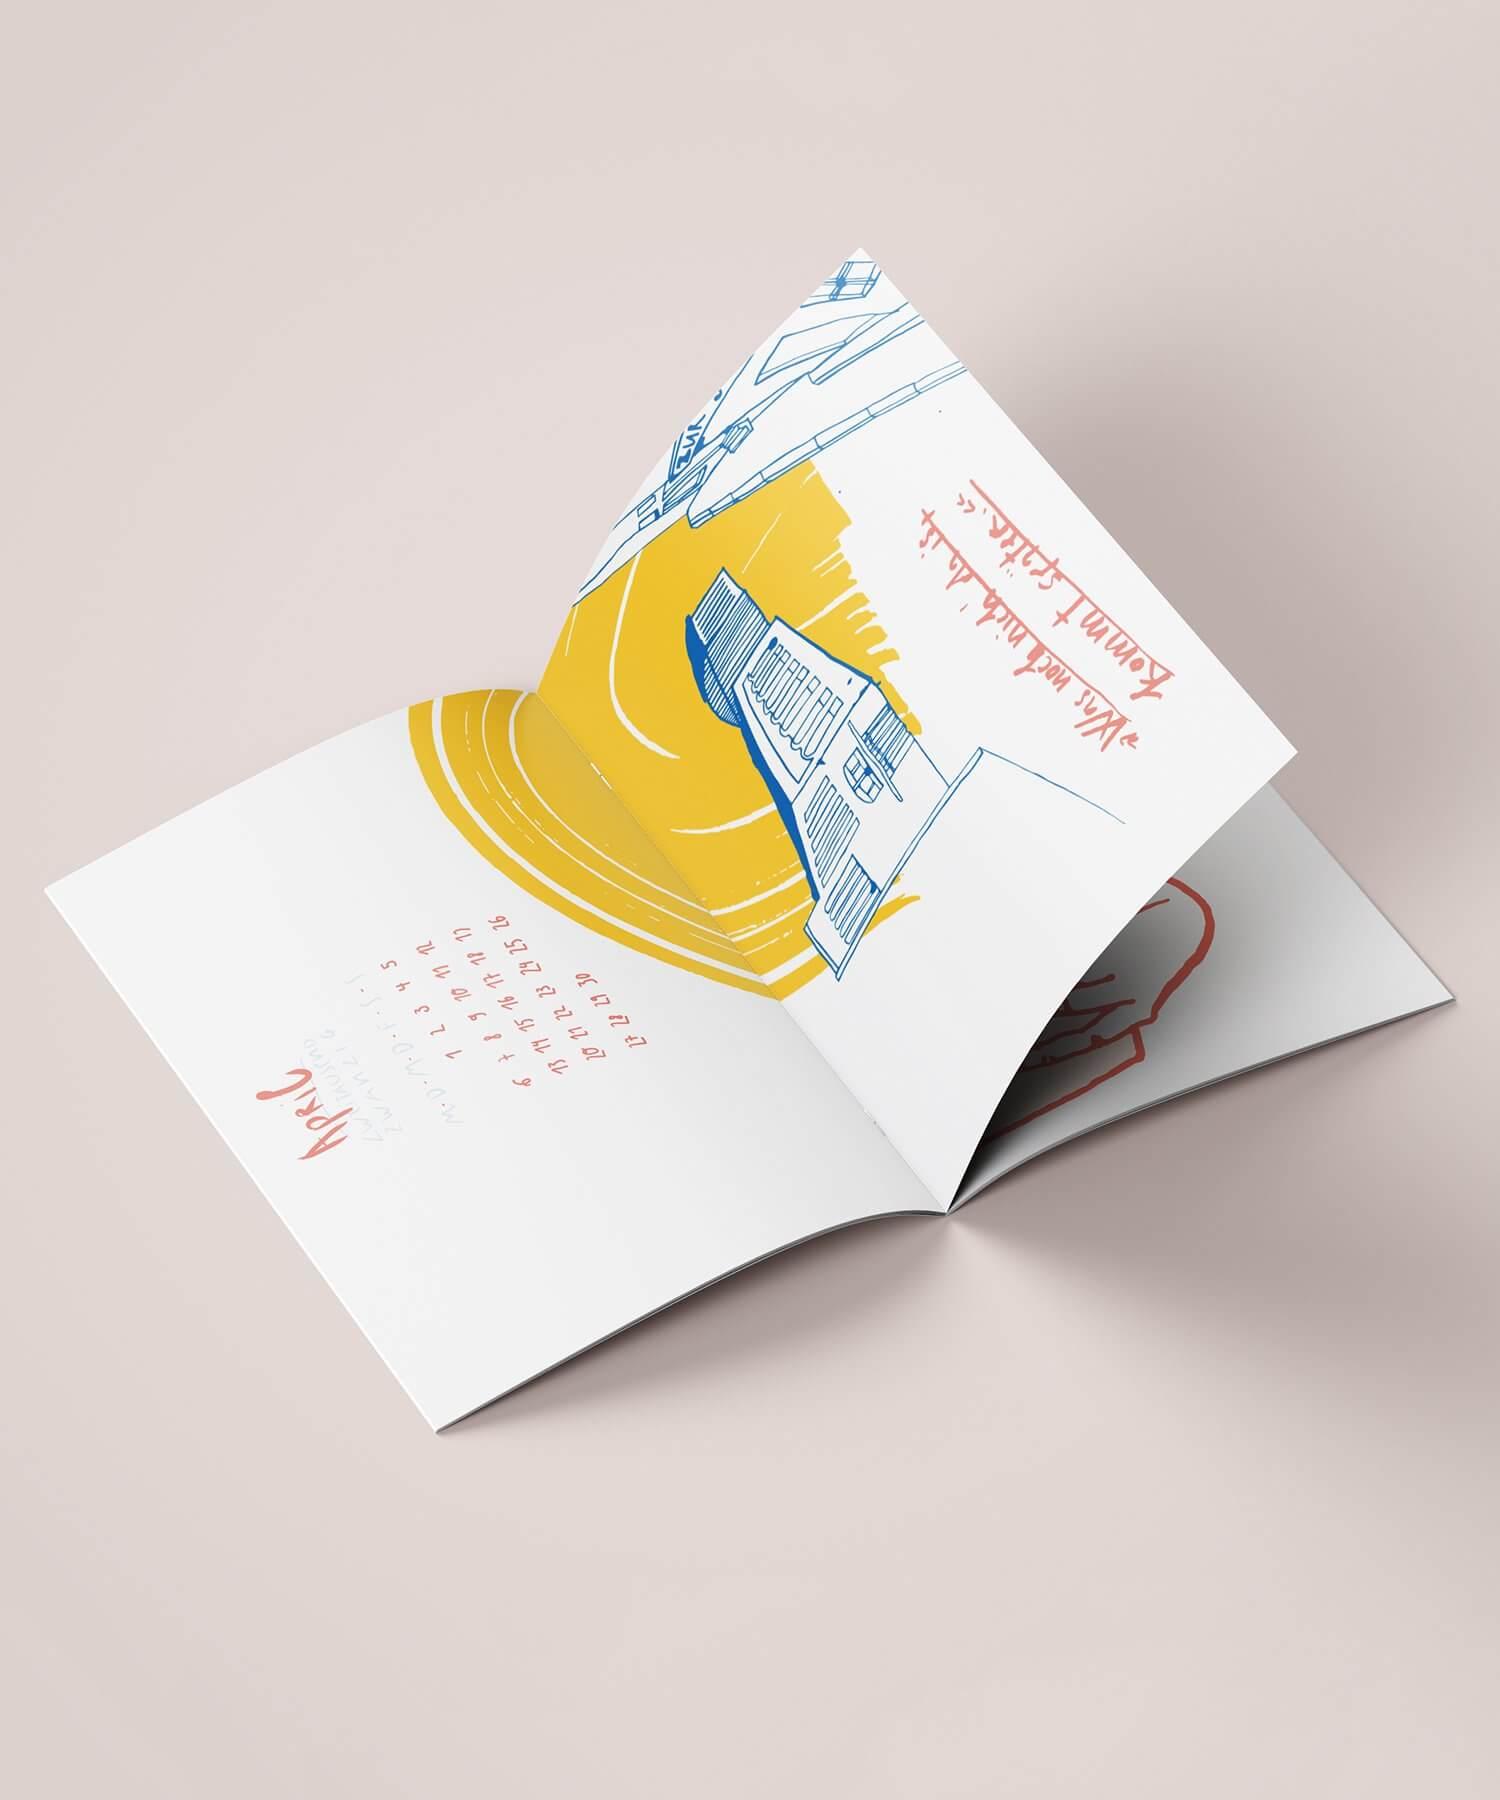 Matrosenhunde Illustration Aprilzeichnung Kalender 2020 Papierkalender Kunstkalender Illustrationskalender